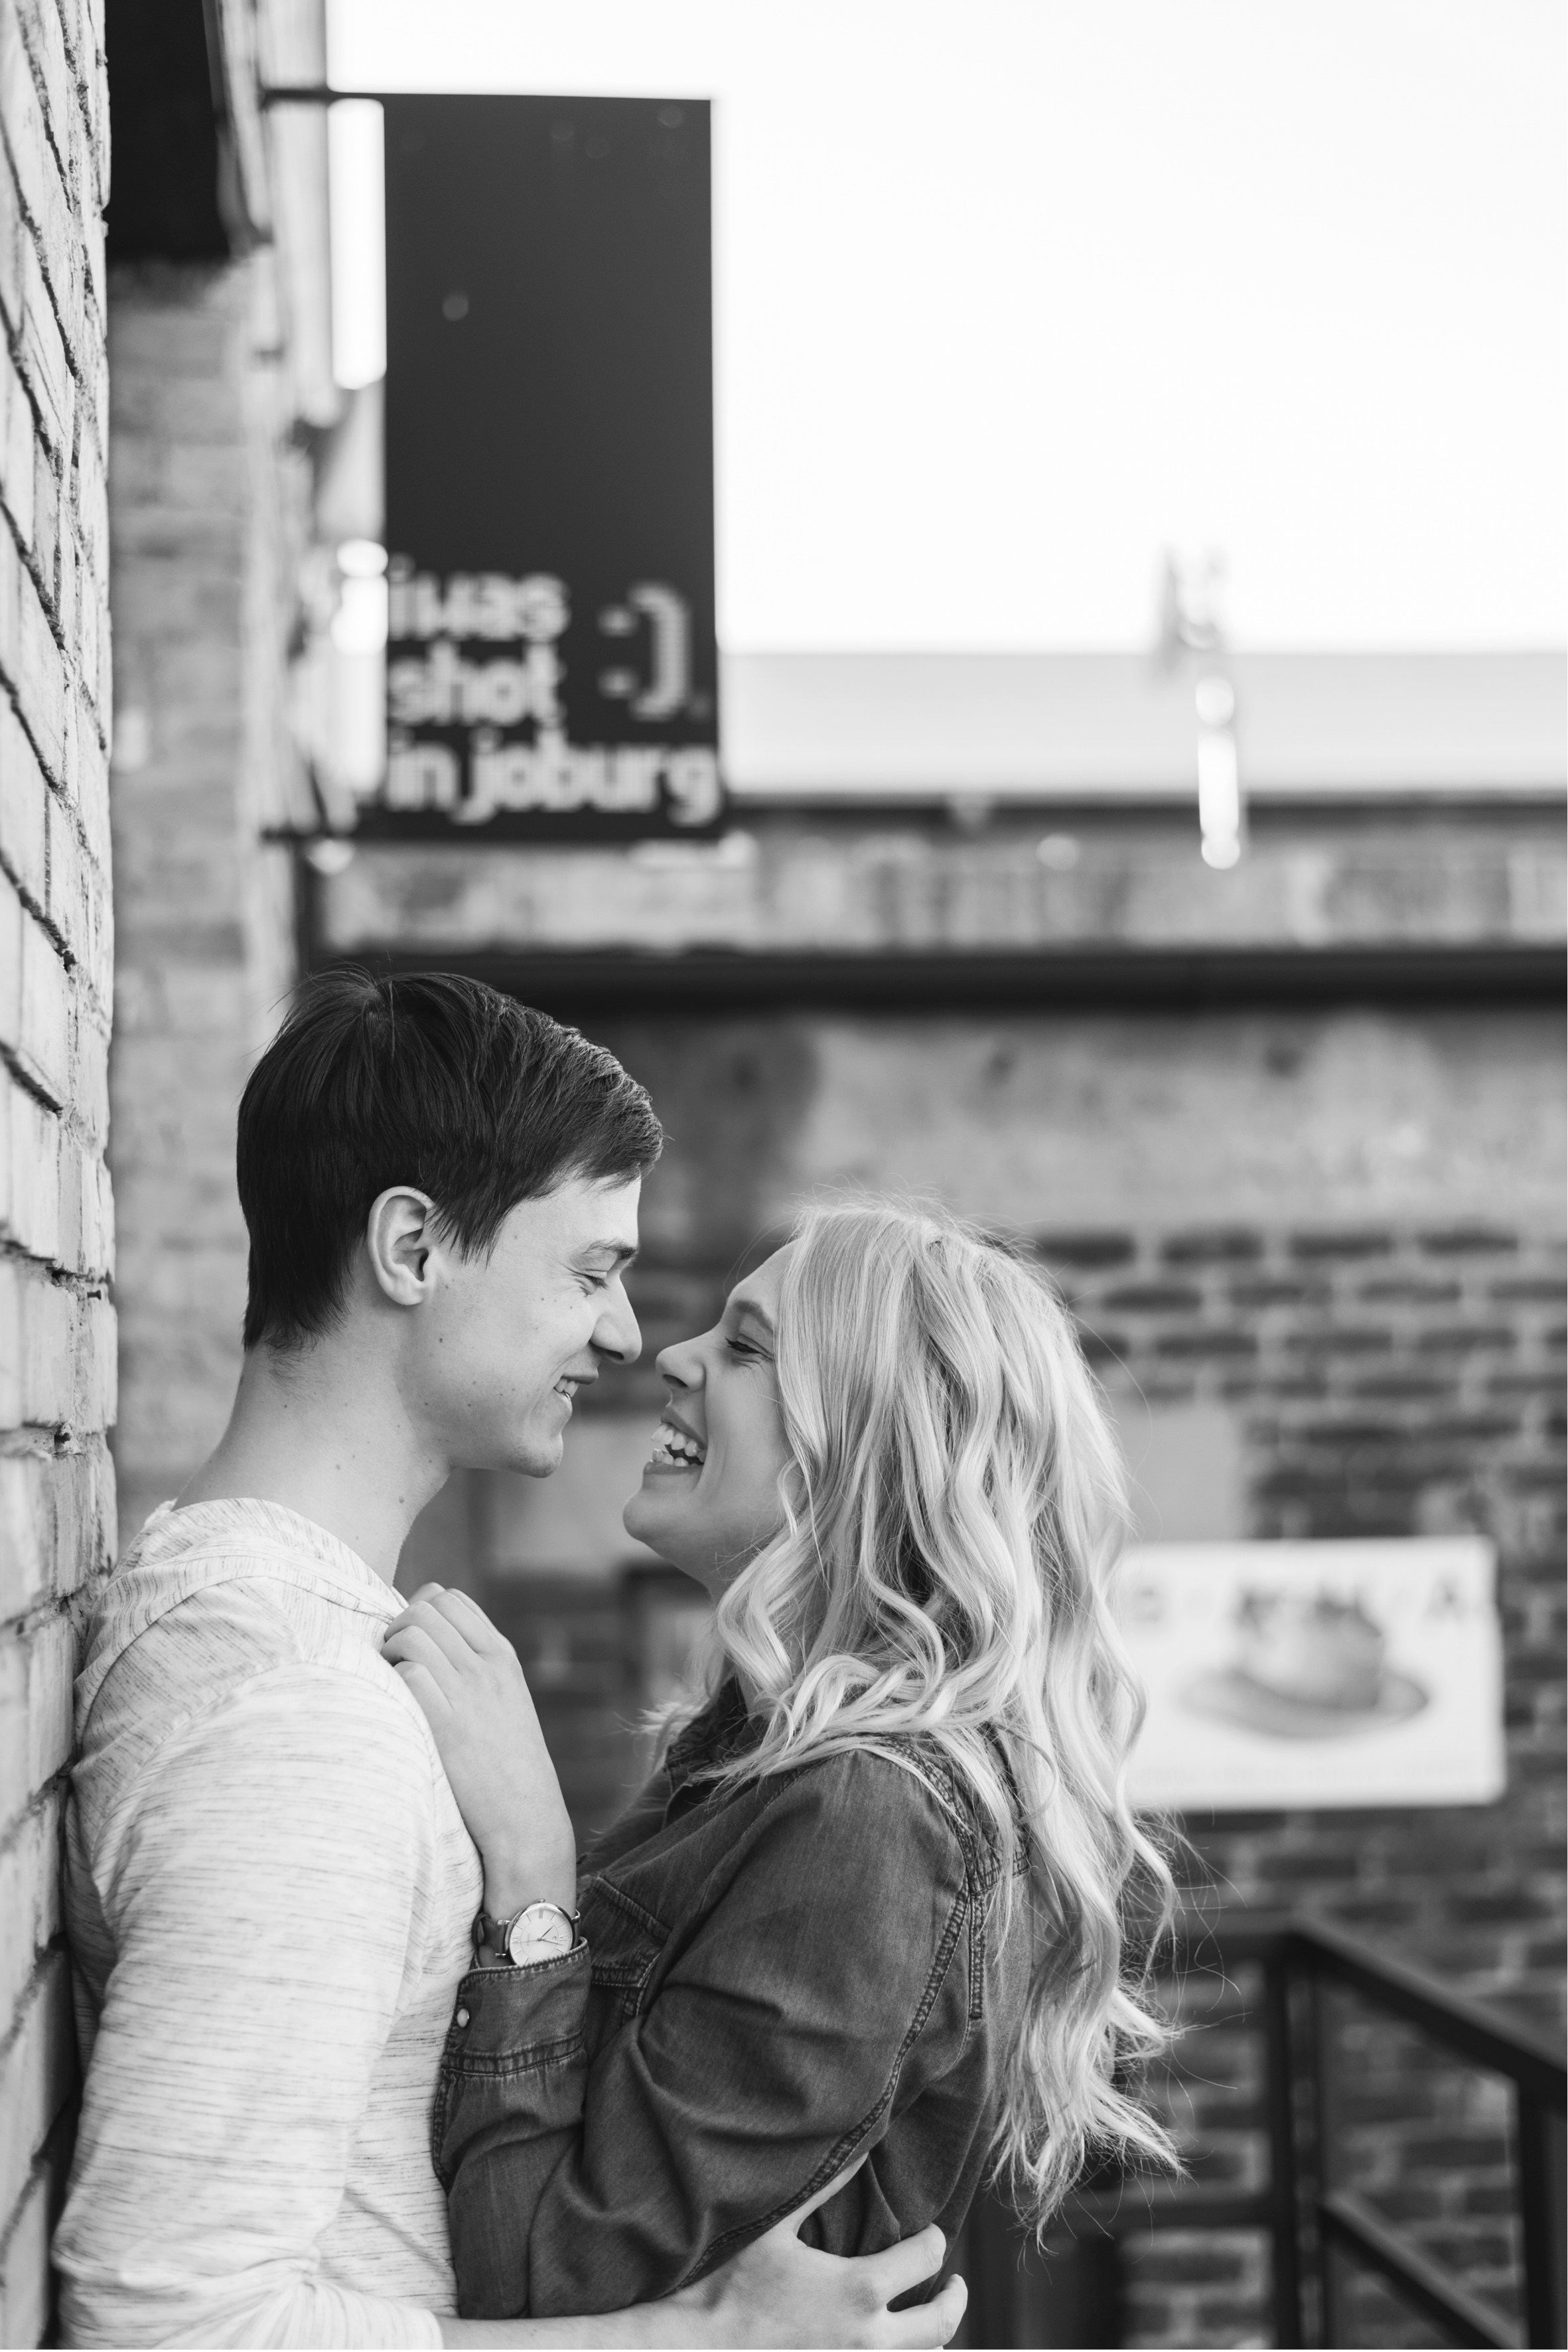 Bronwyn Alyson - Caitlin & Athan Couple Maboneng 11.jpg